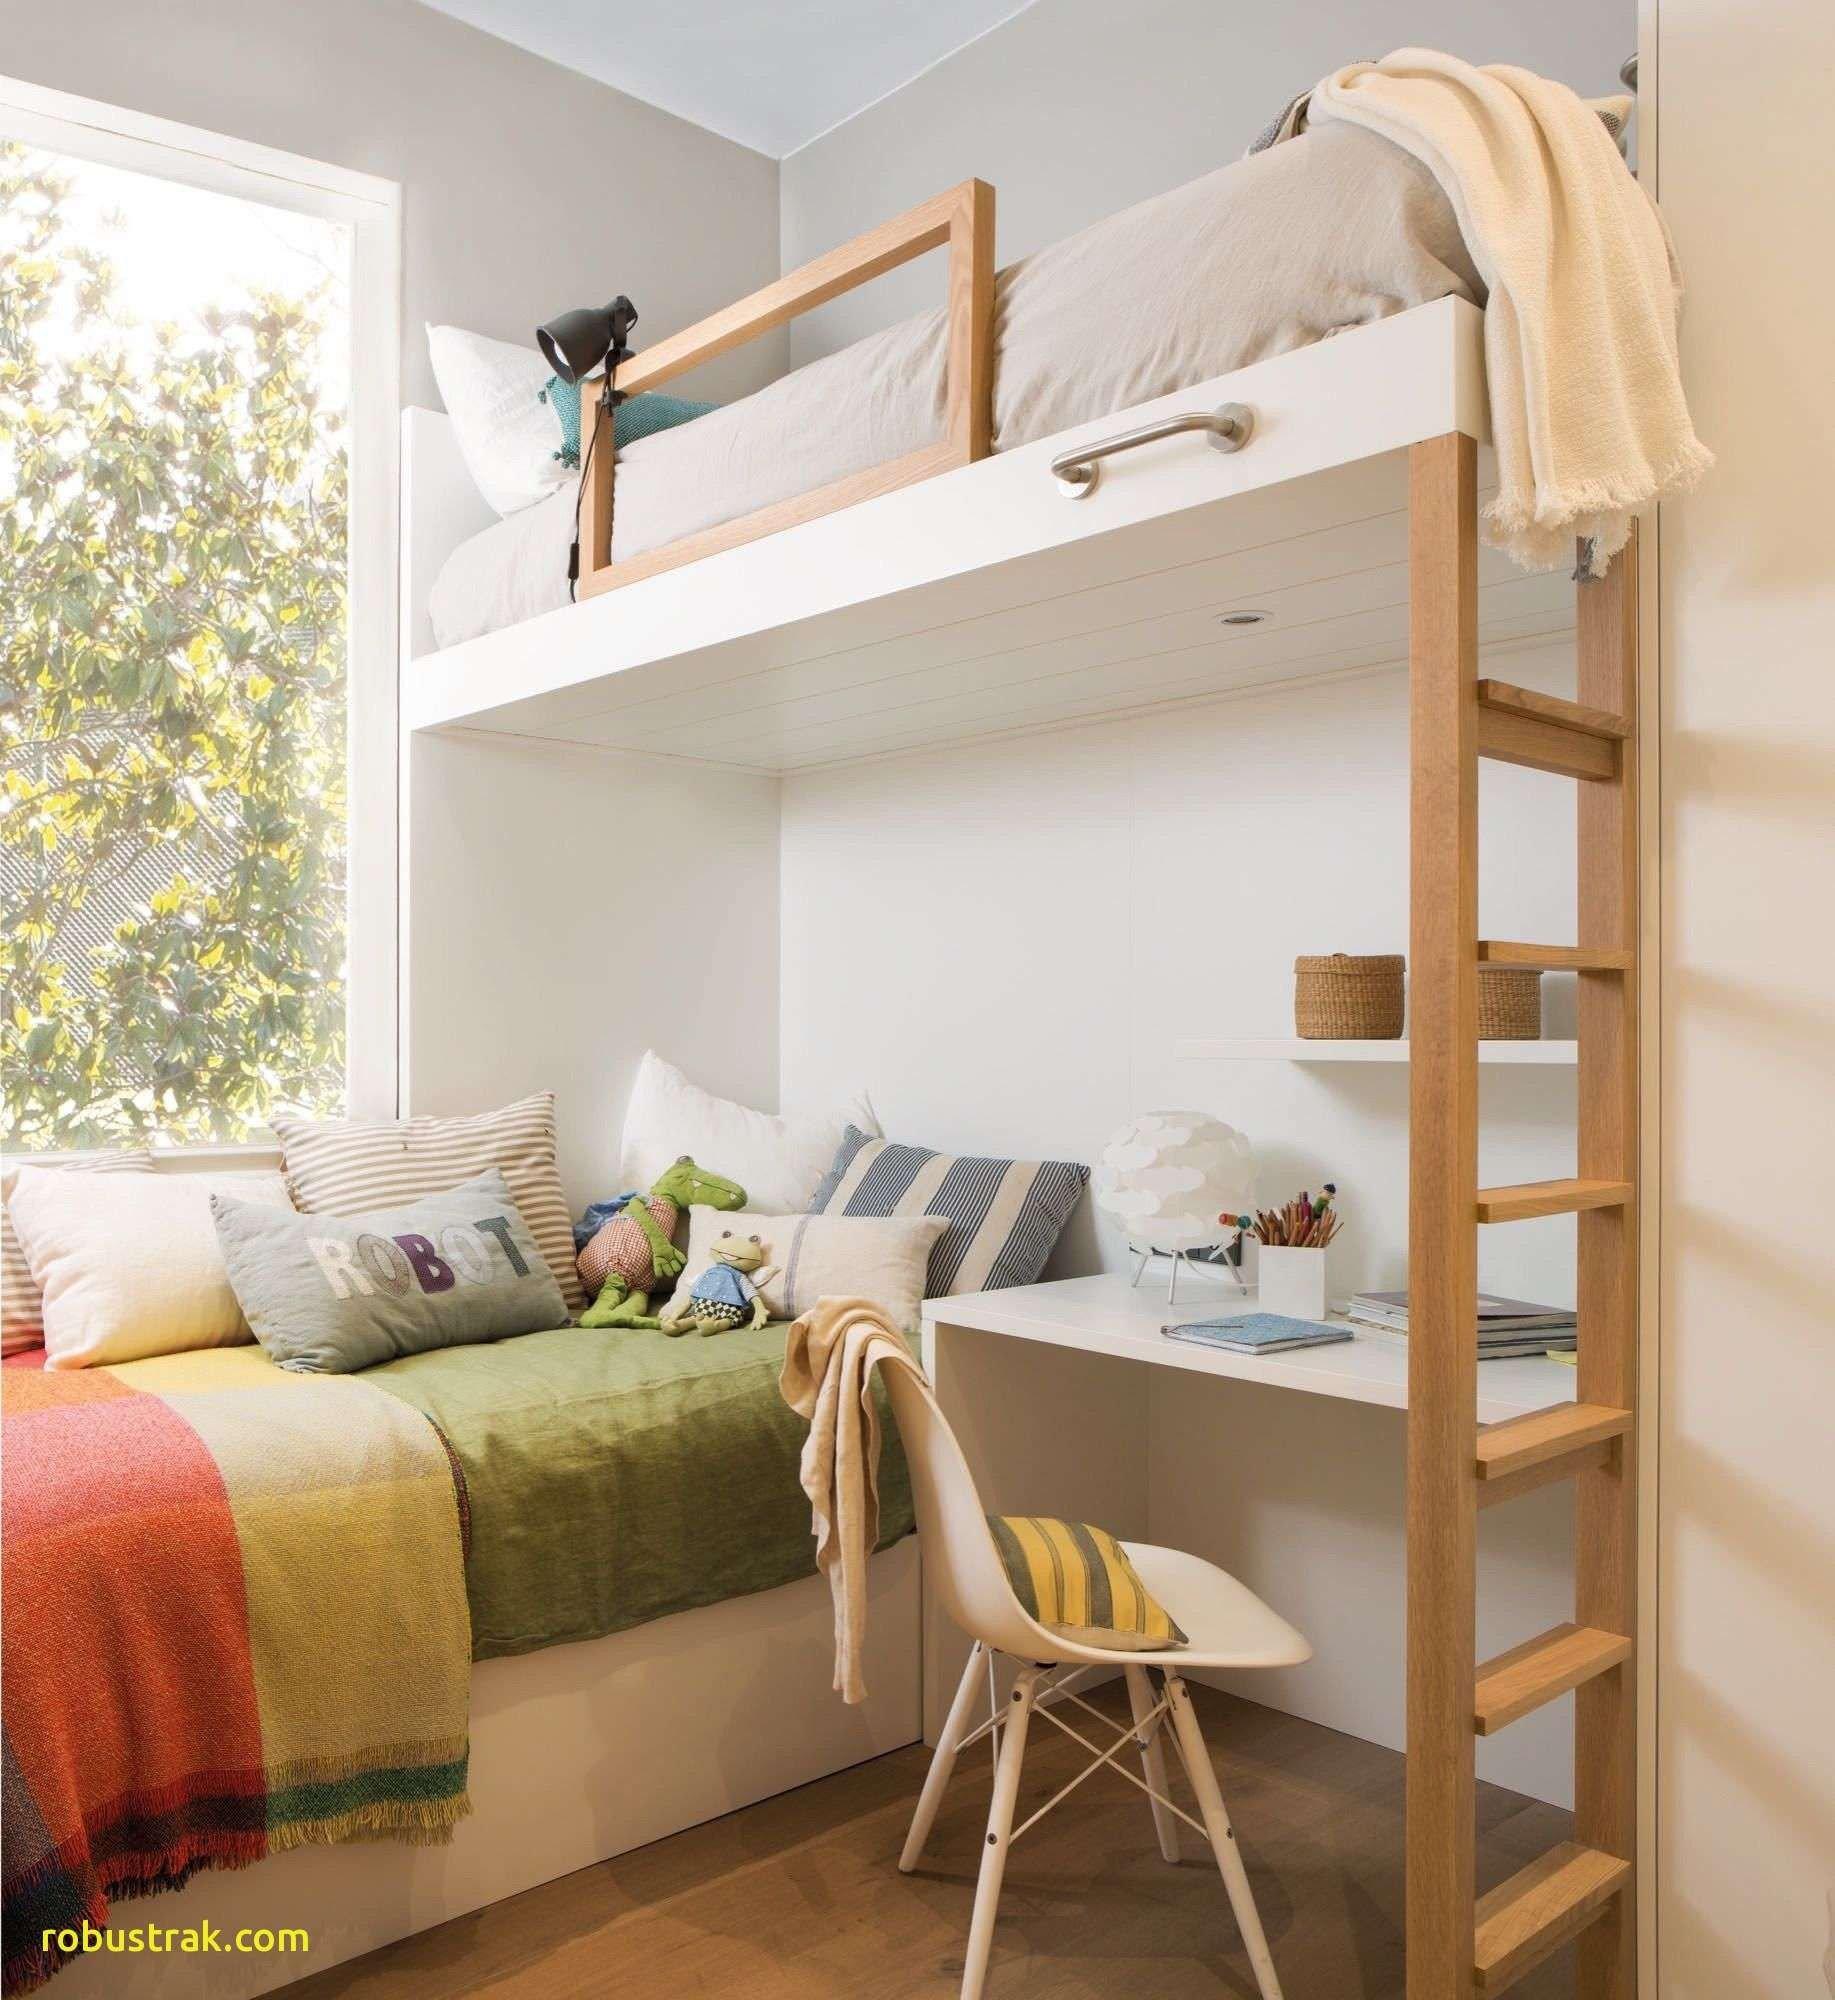 Loft Bed Bedroom Ideas Elegant Pin On House Ideas